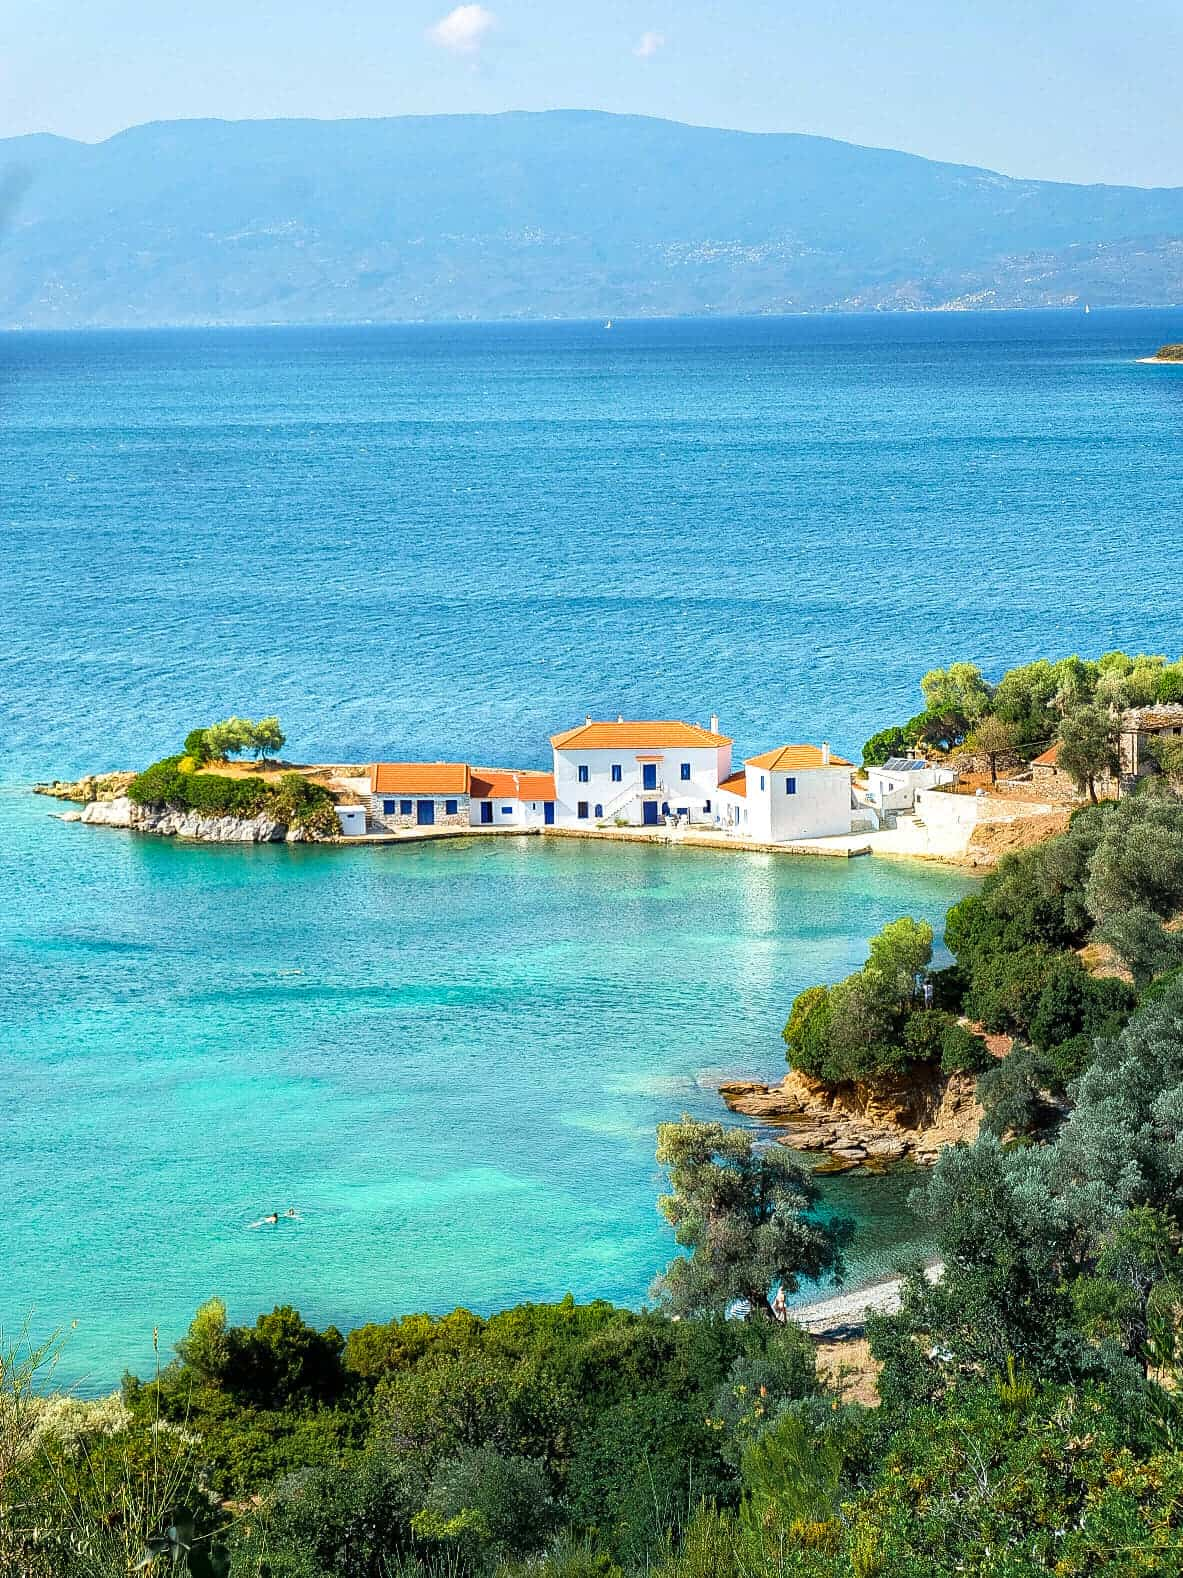 grece-road-trip-3-semaines